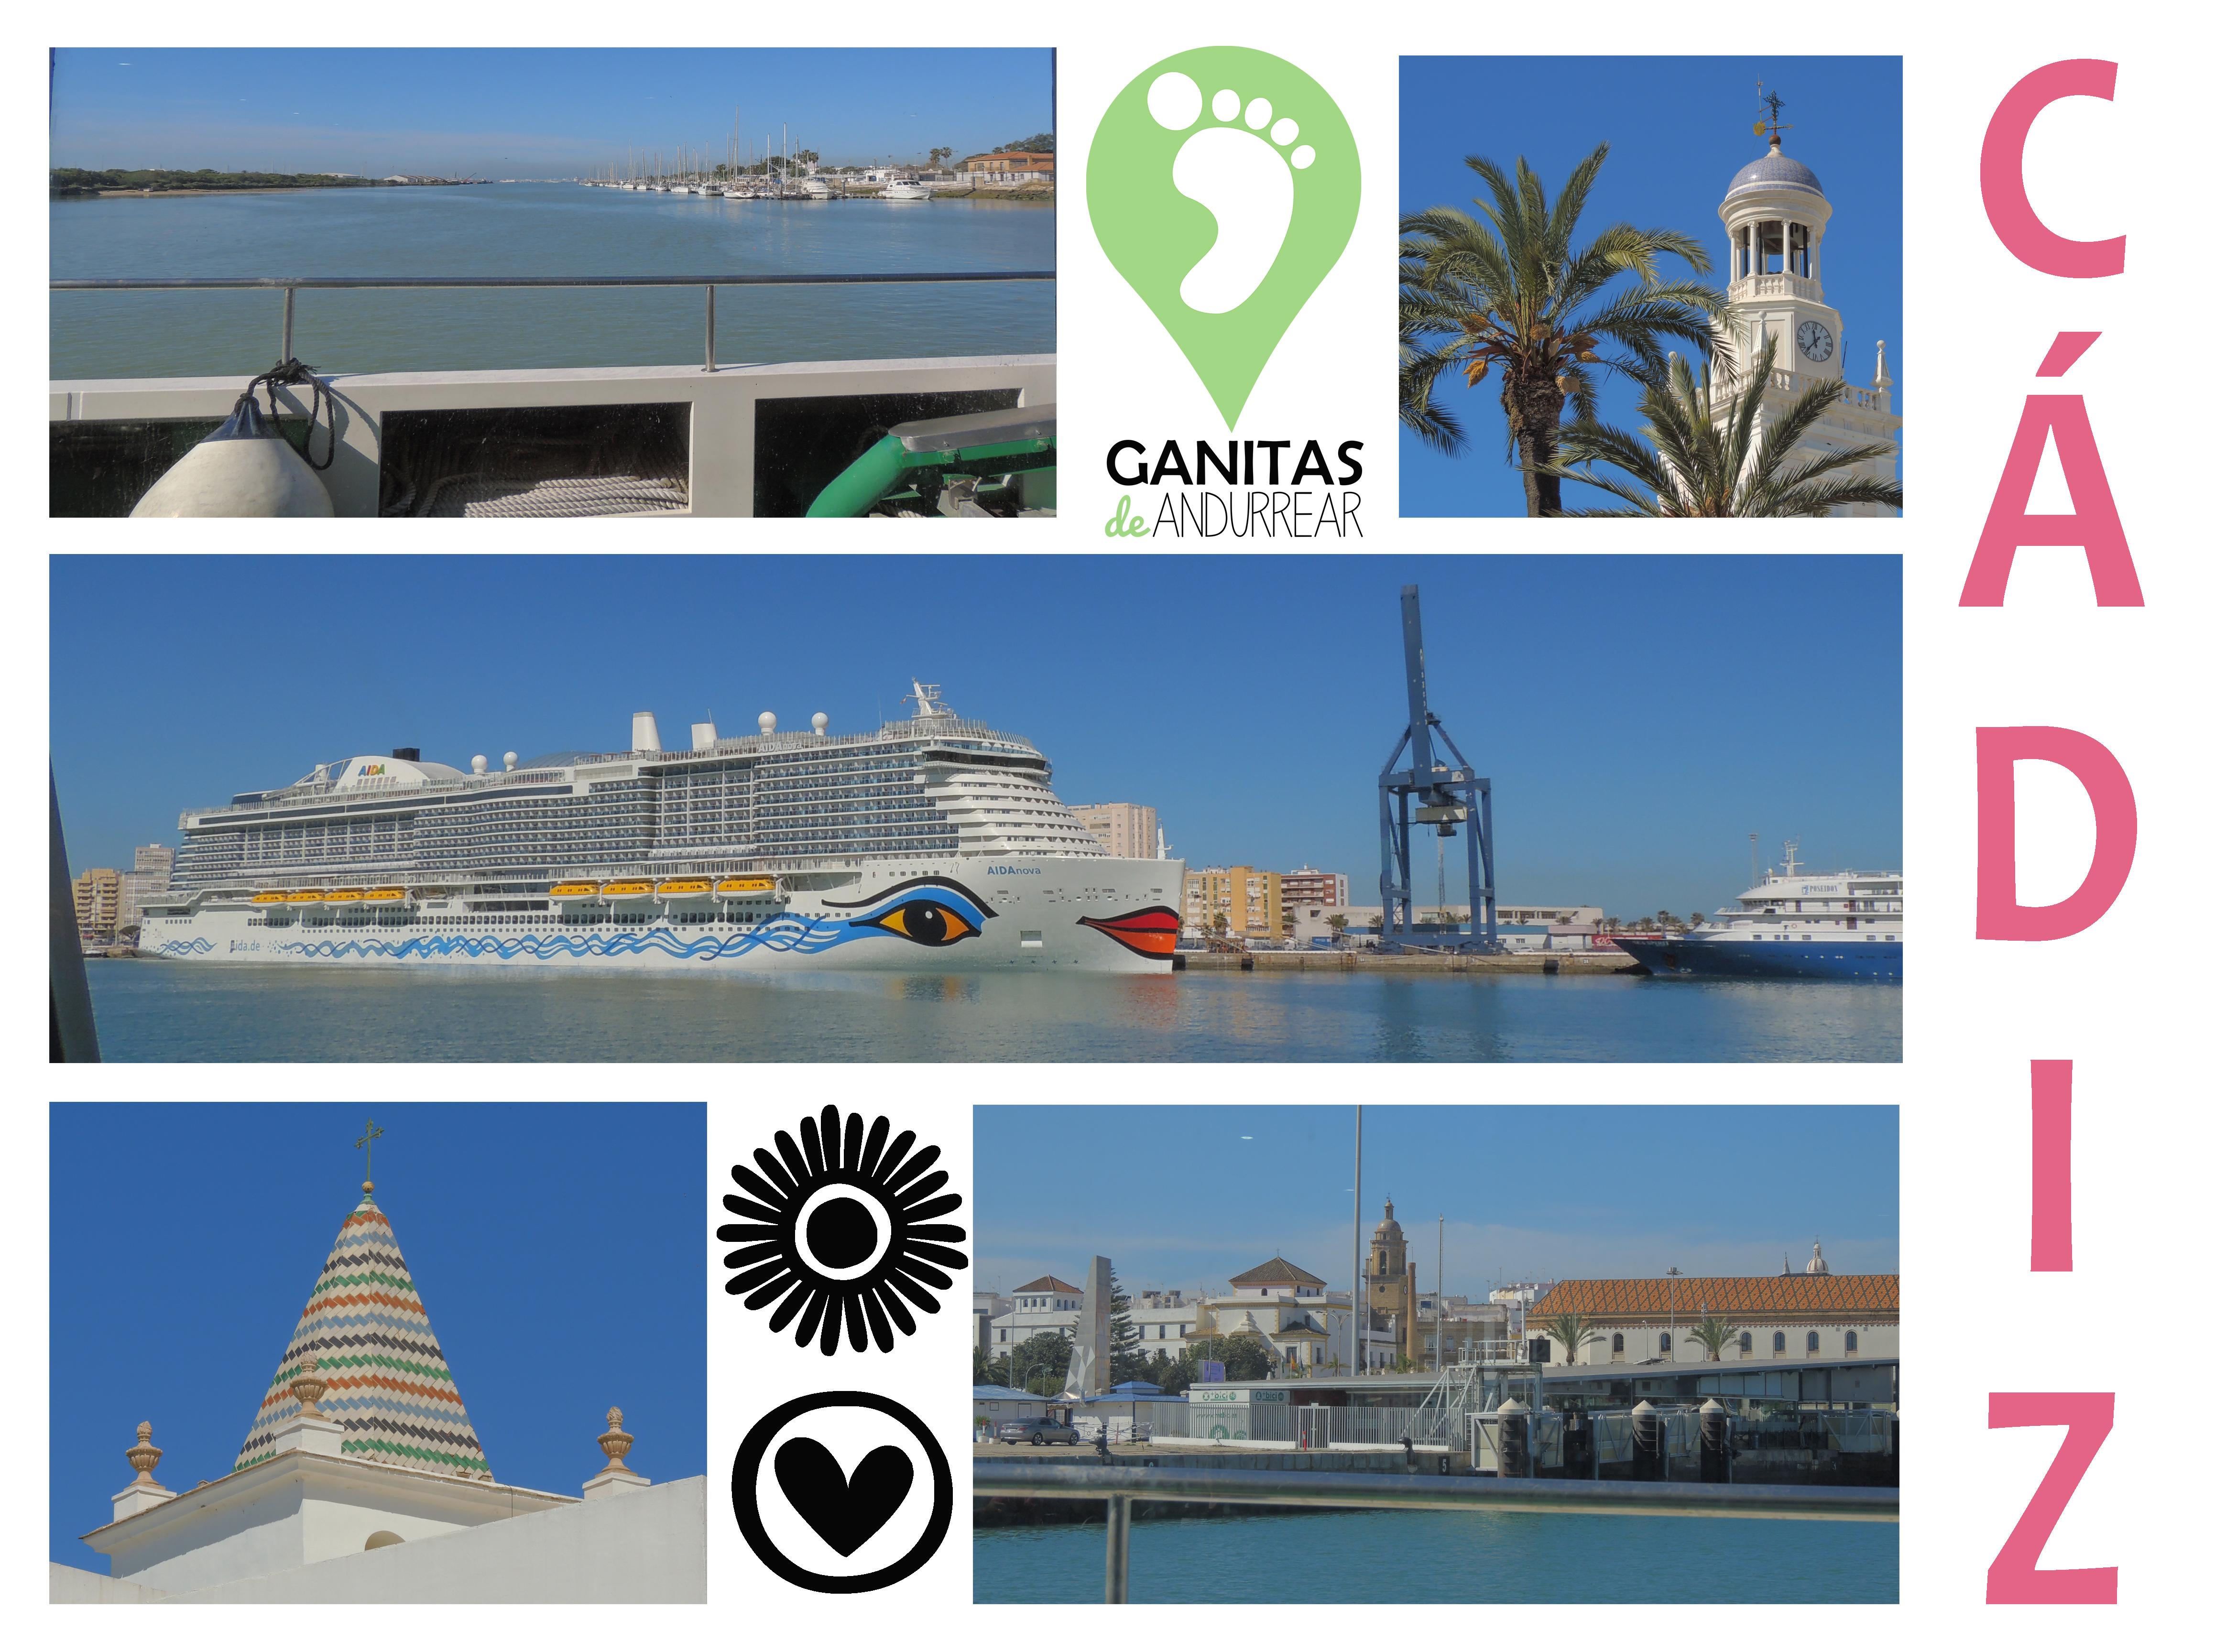 Cádiz ganitas de andurrear